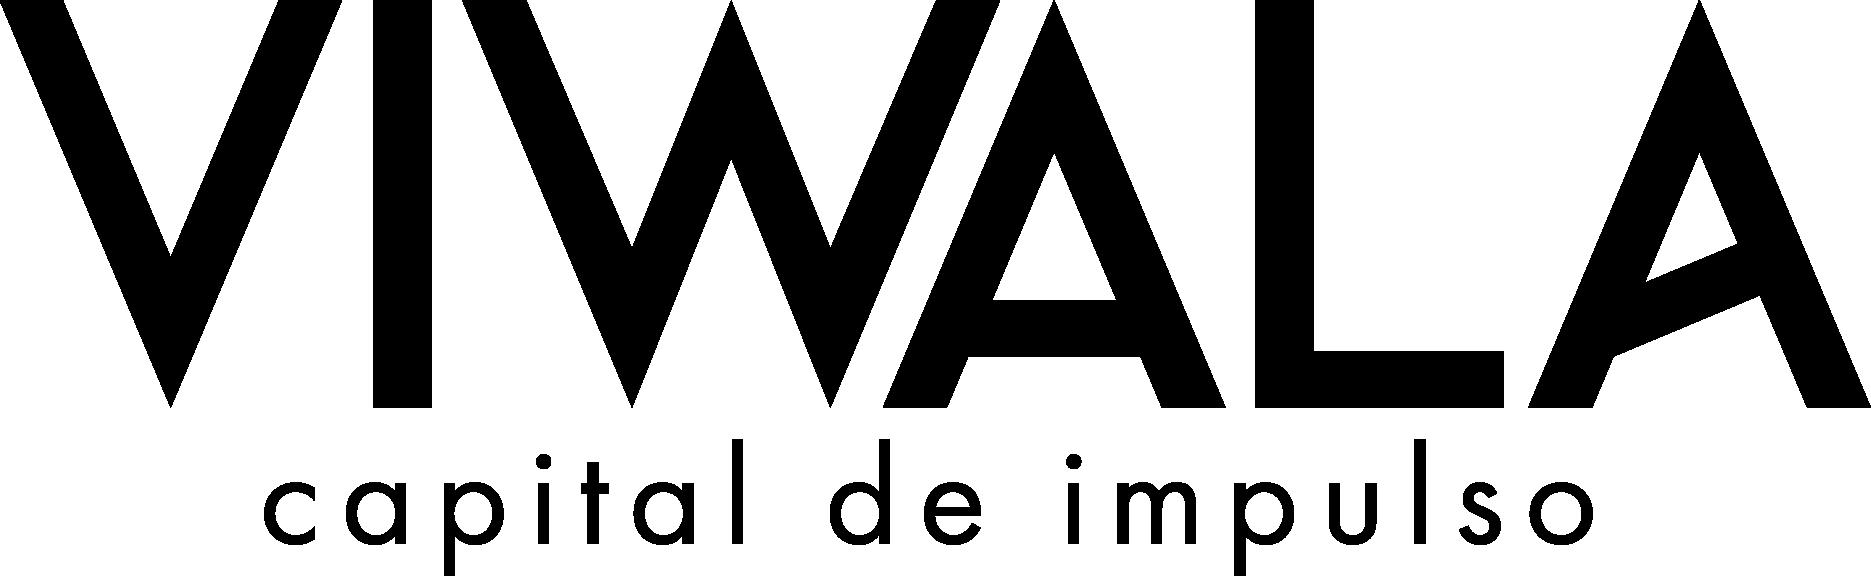 VIWALA